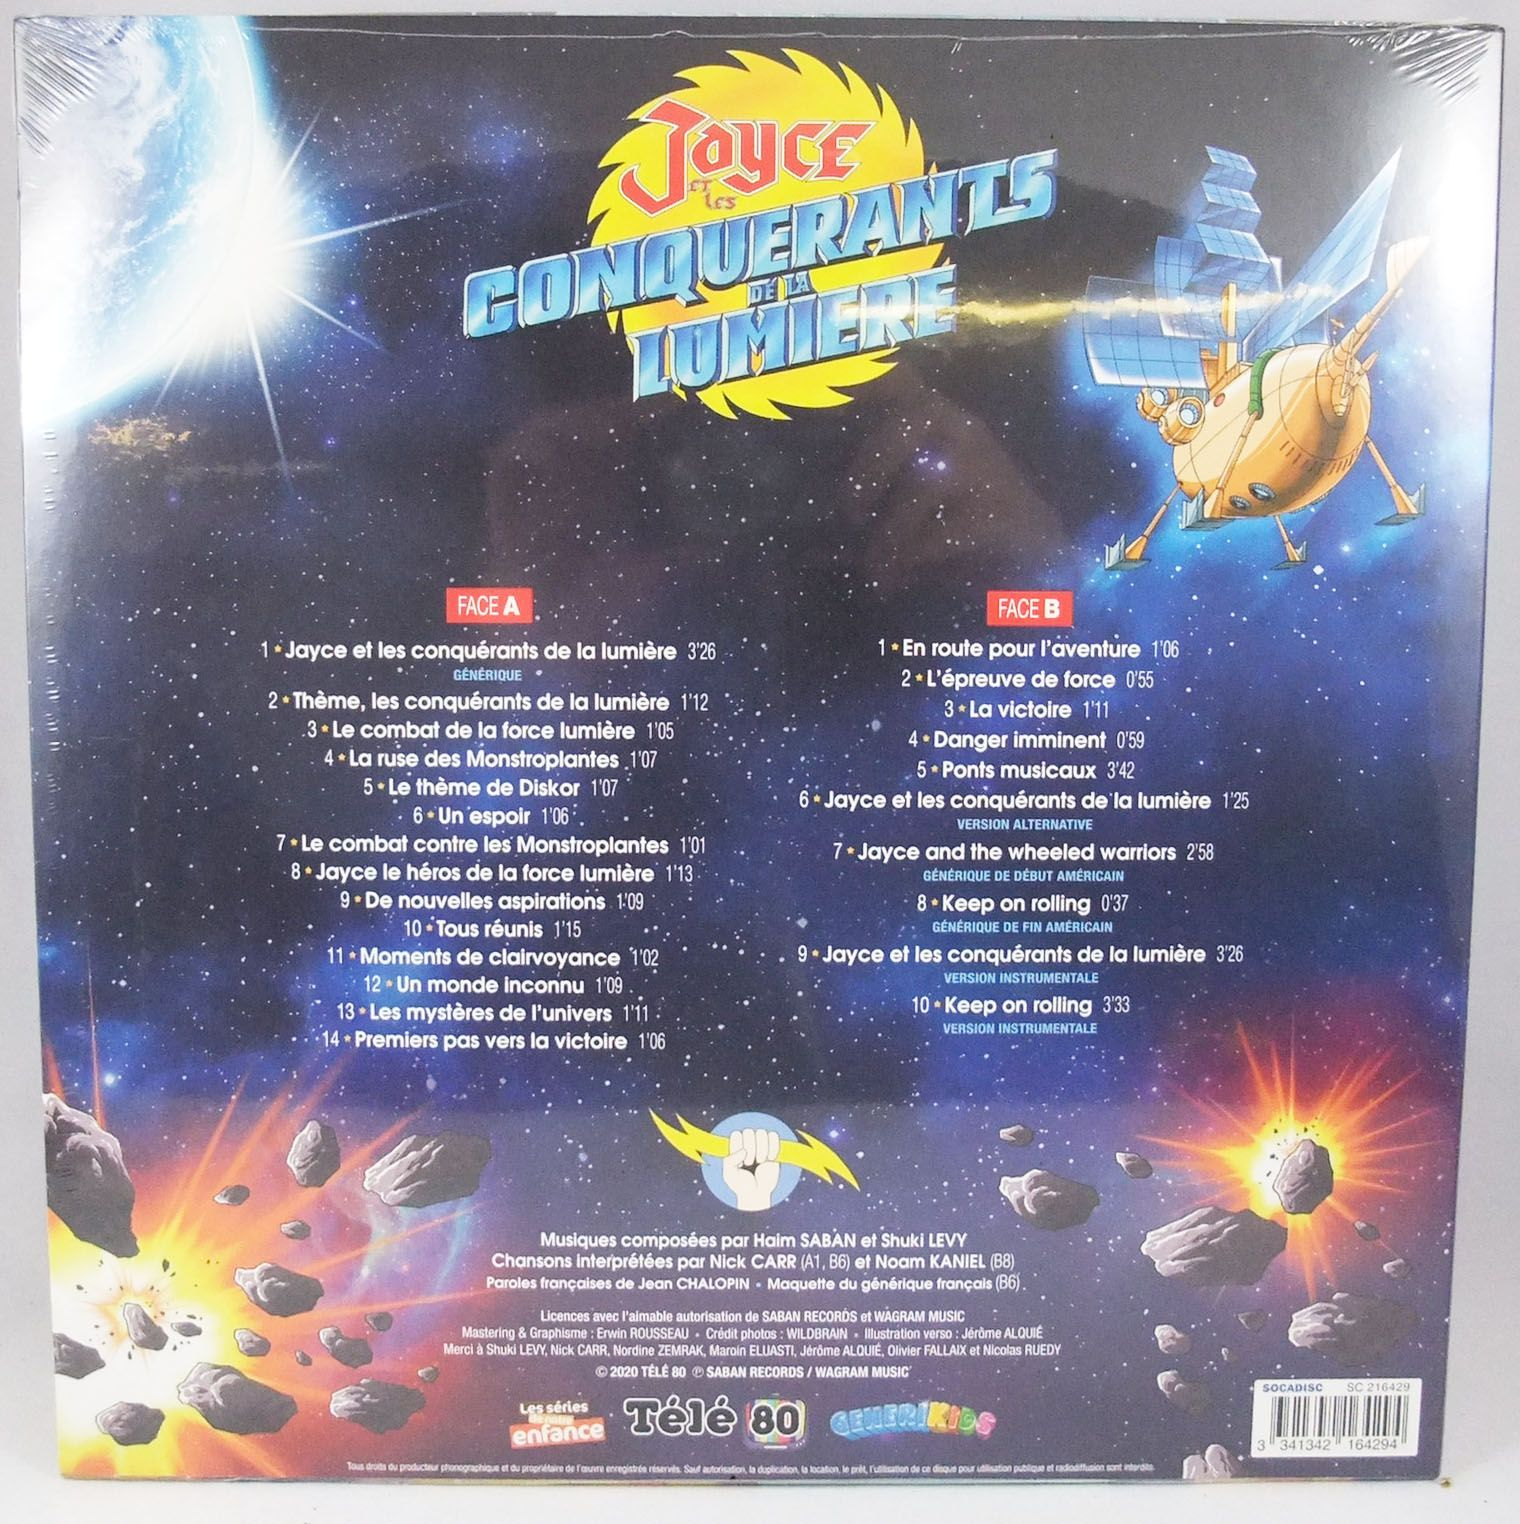 Jayce & the Wheeled Warriors - 33t LP Vinyl disc - Original TV series soundtrack